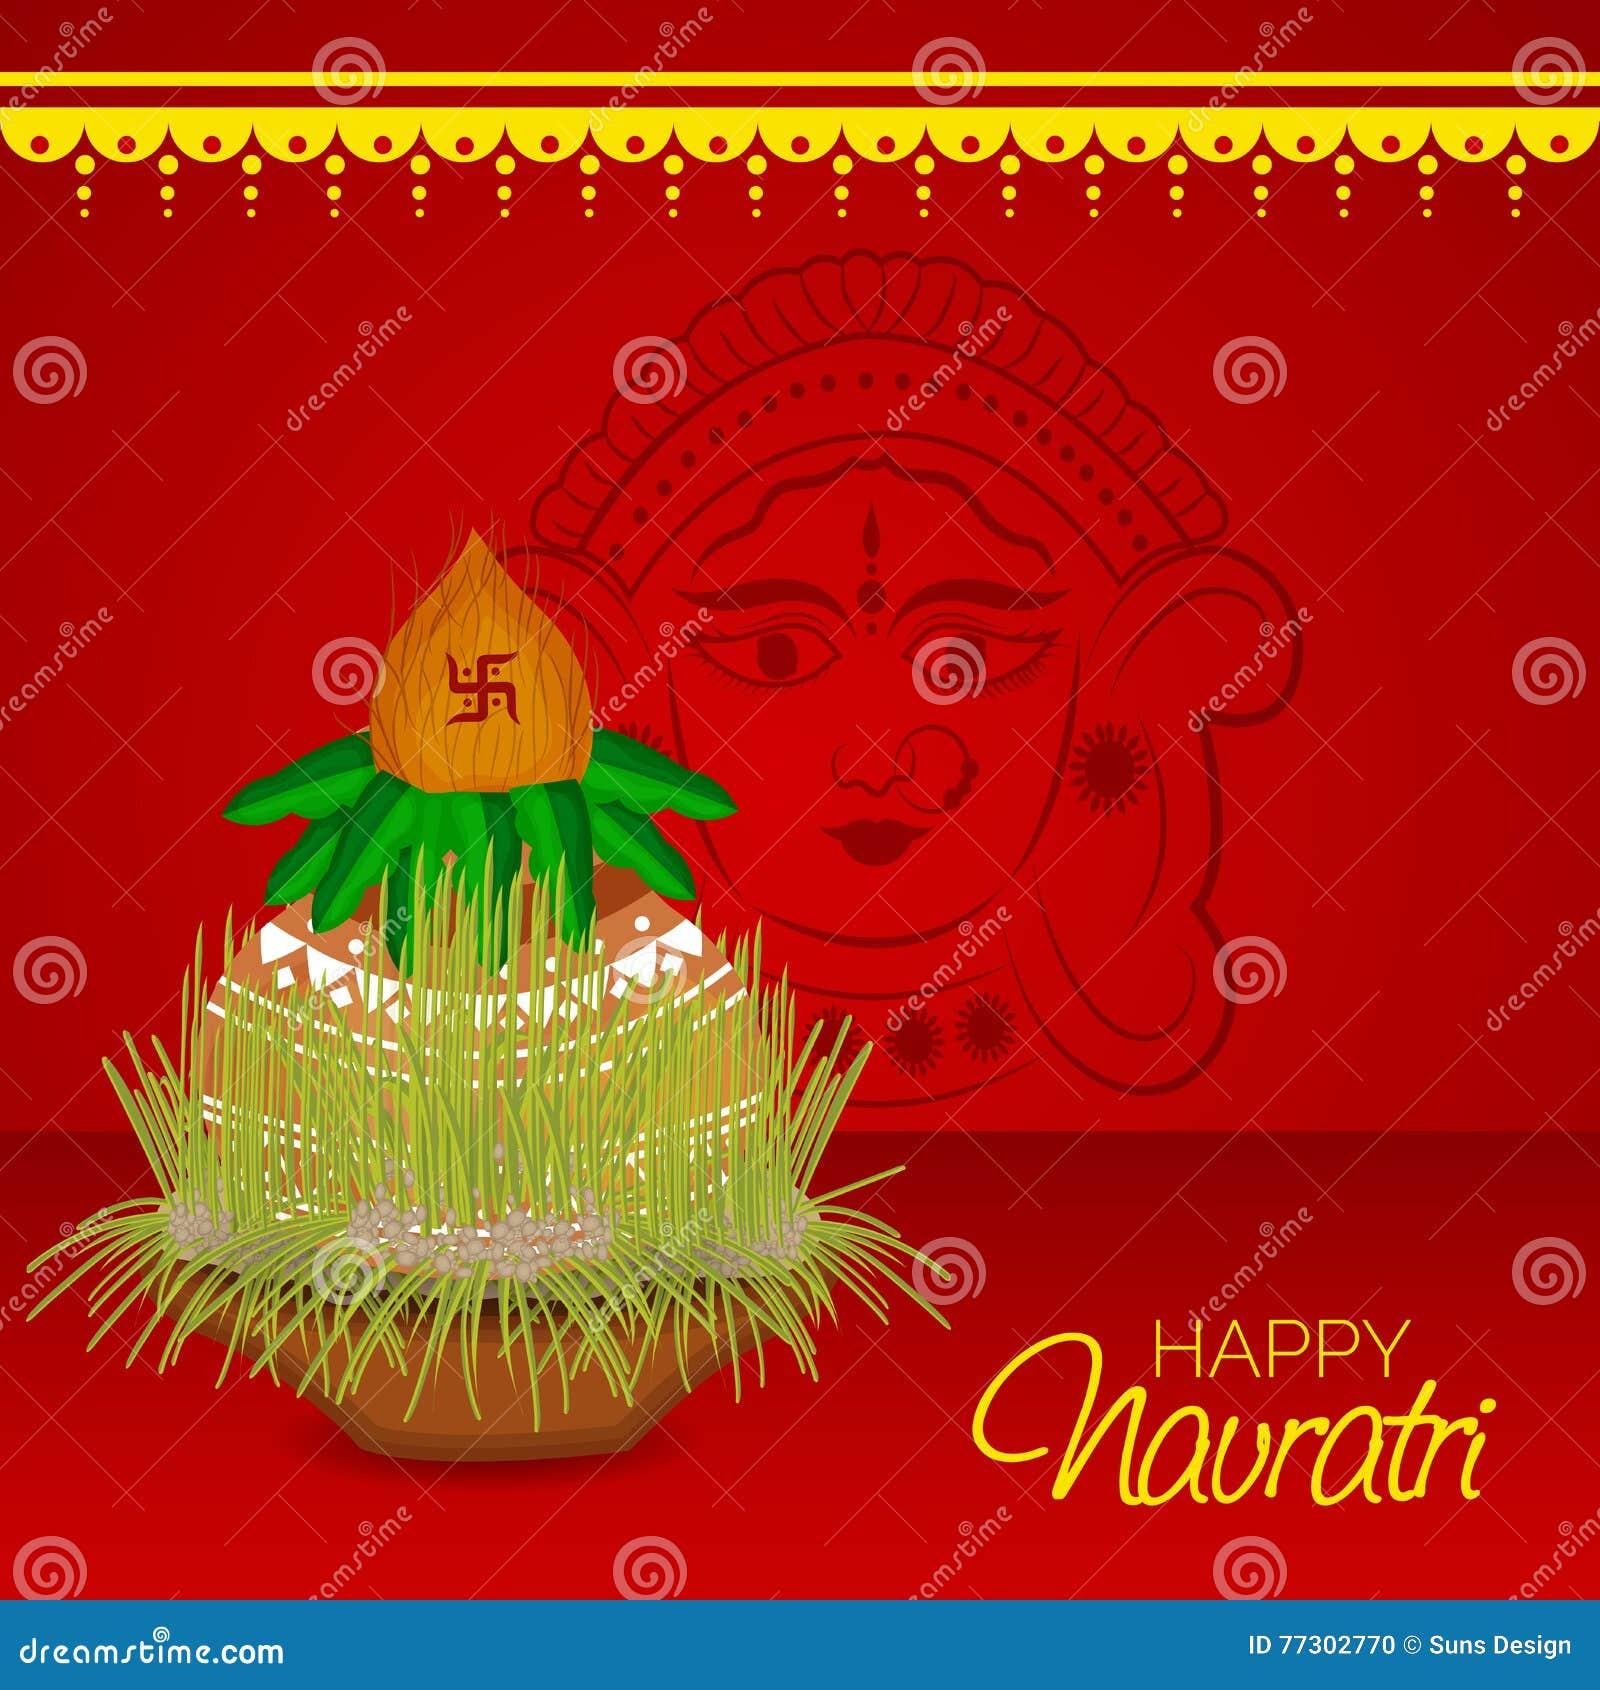 Navratri stock illustration illustration of auspicious 77302770 navratri auspicious happiness kristyandbryce Choice Image